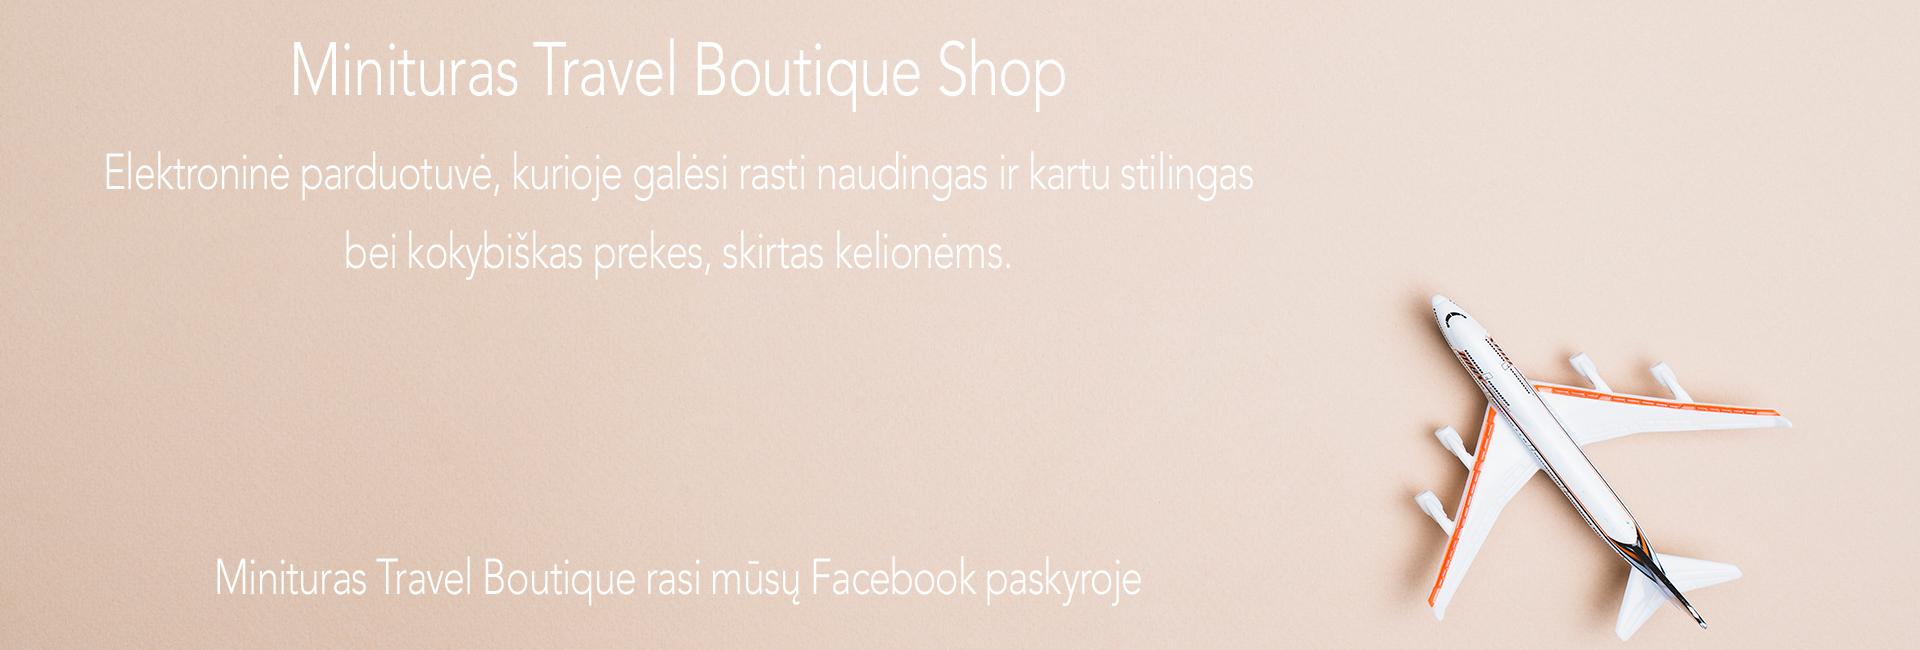 shopas